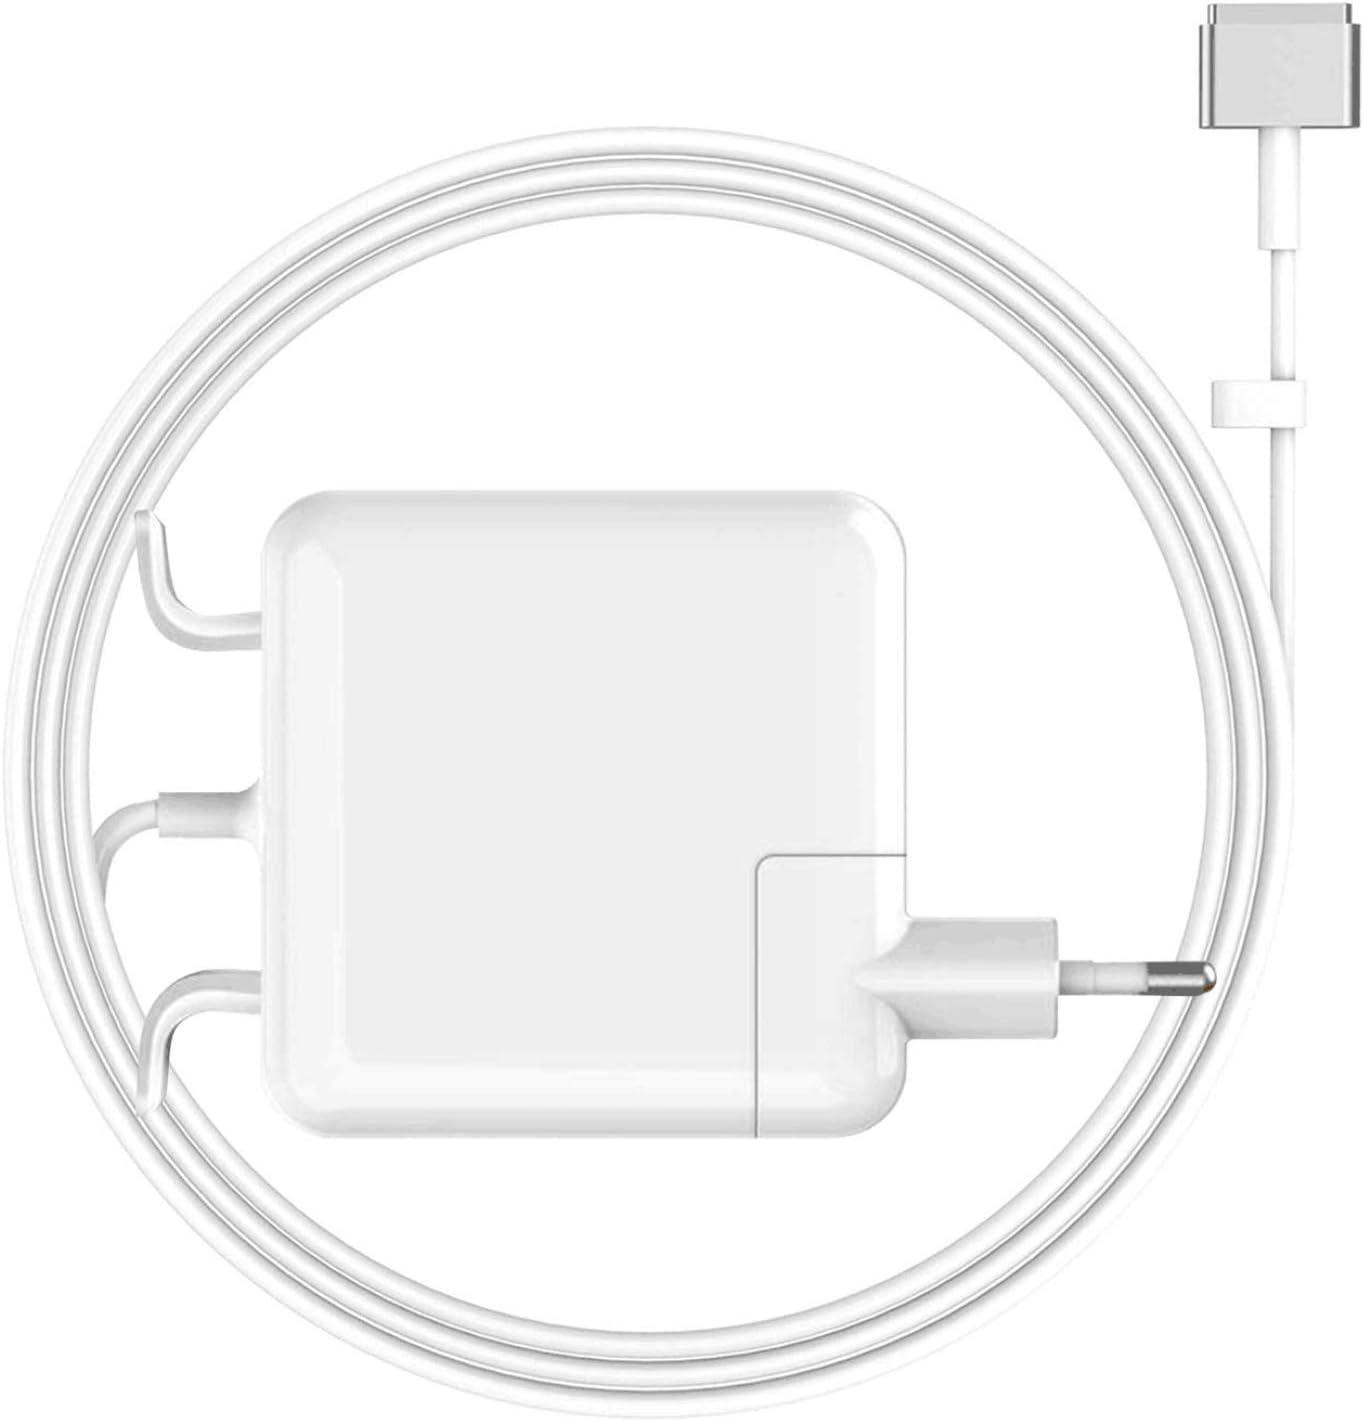 2015 Ywcking Kompatibel mit Mac Book Air Ladeger/ät,45W Magnet-T-Ladeger/ät Kompatibel mit Mac Air 11  und 13 Zoll Mitte 2012 2017 Modelle A1465 A1466 2014 2013